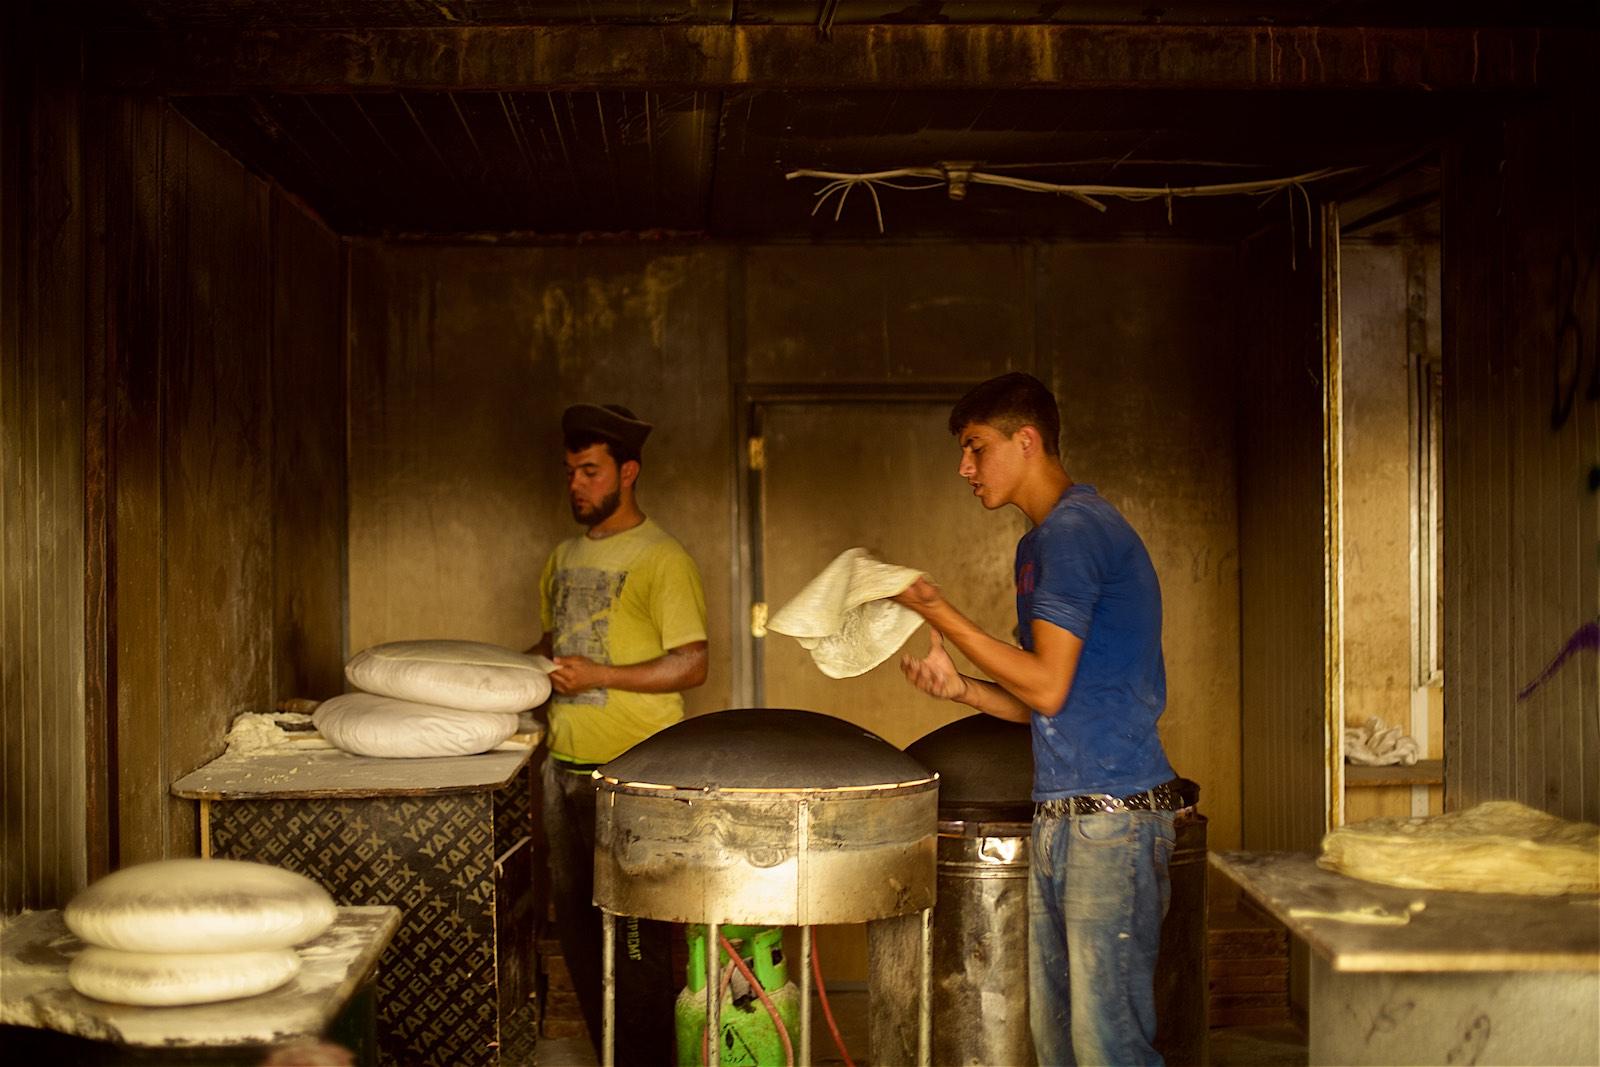 denis-bosnic-zaatari-jordan-refugee-camp-16.jpg